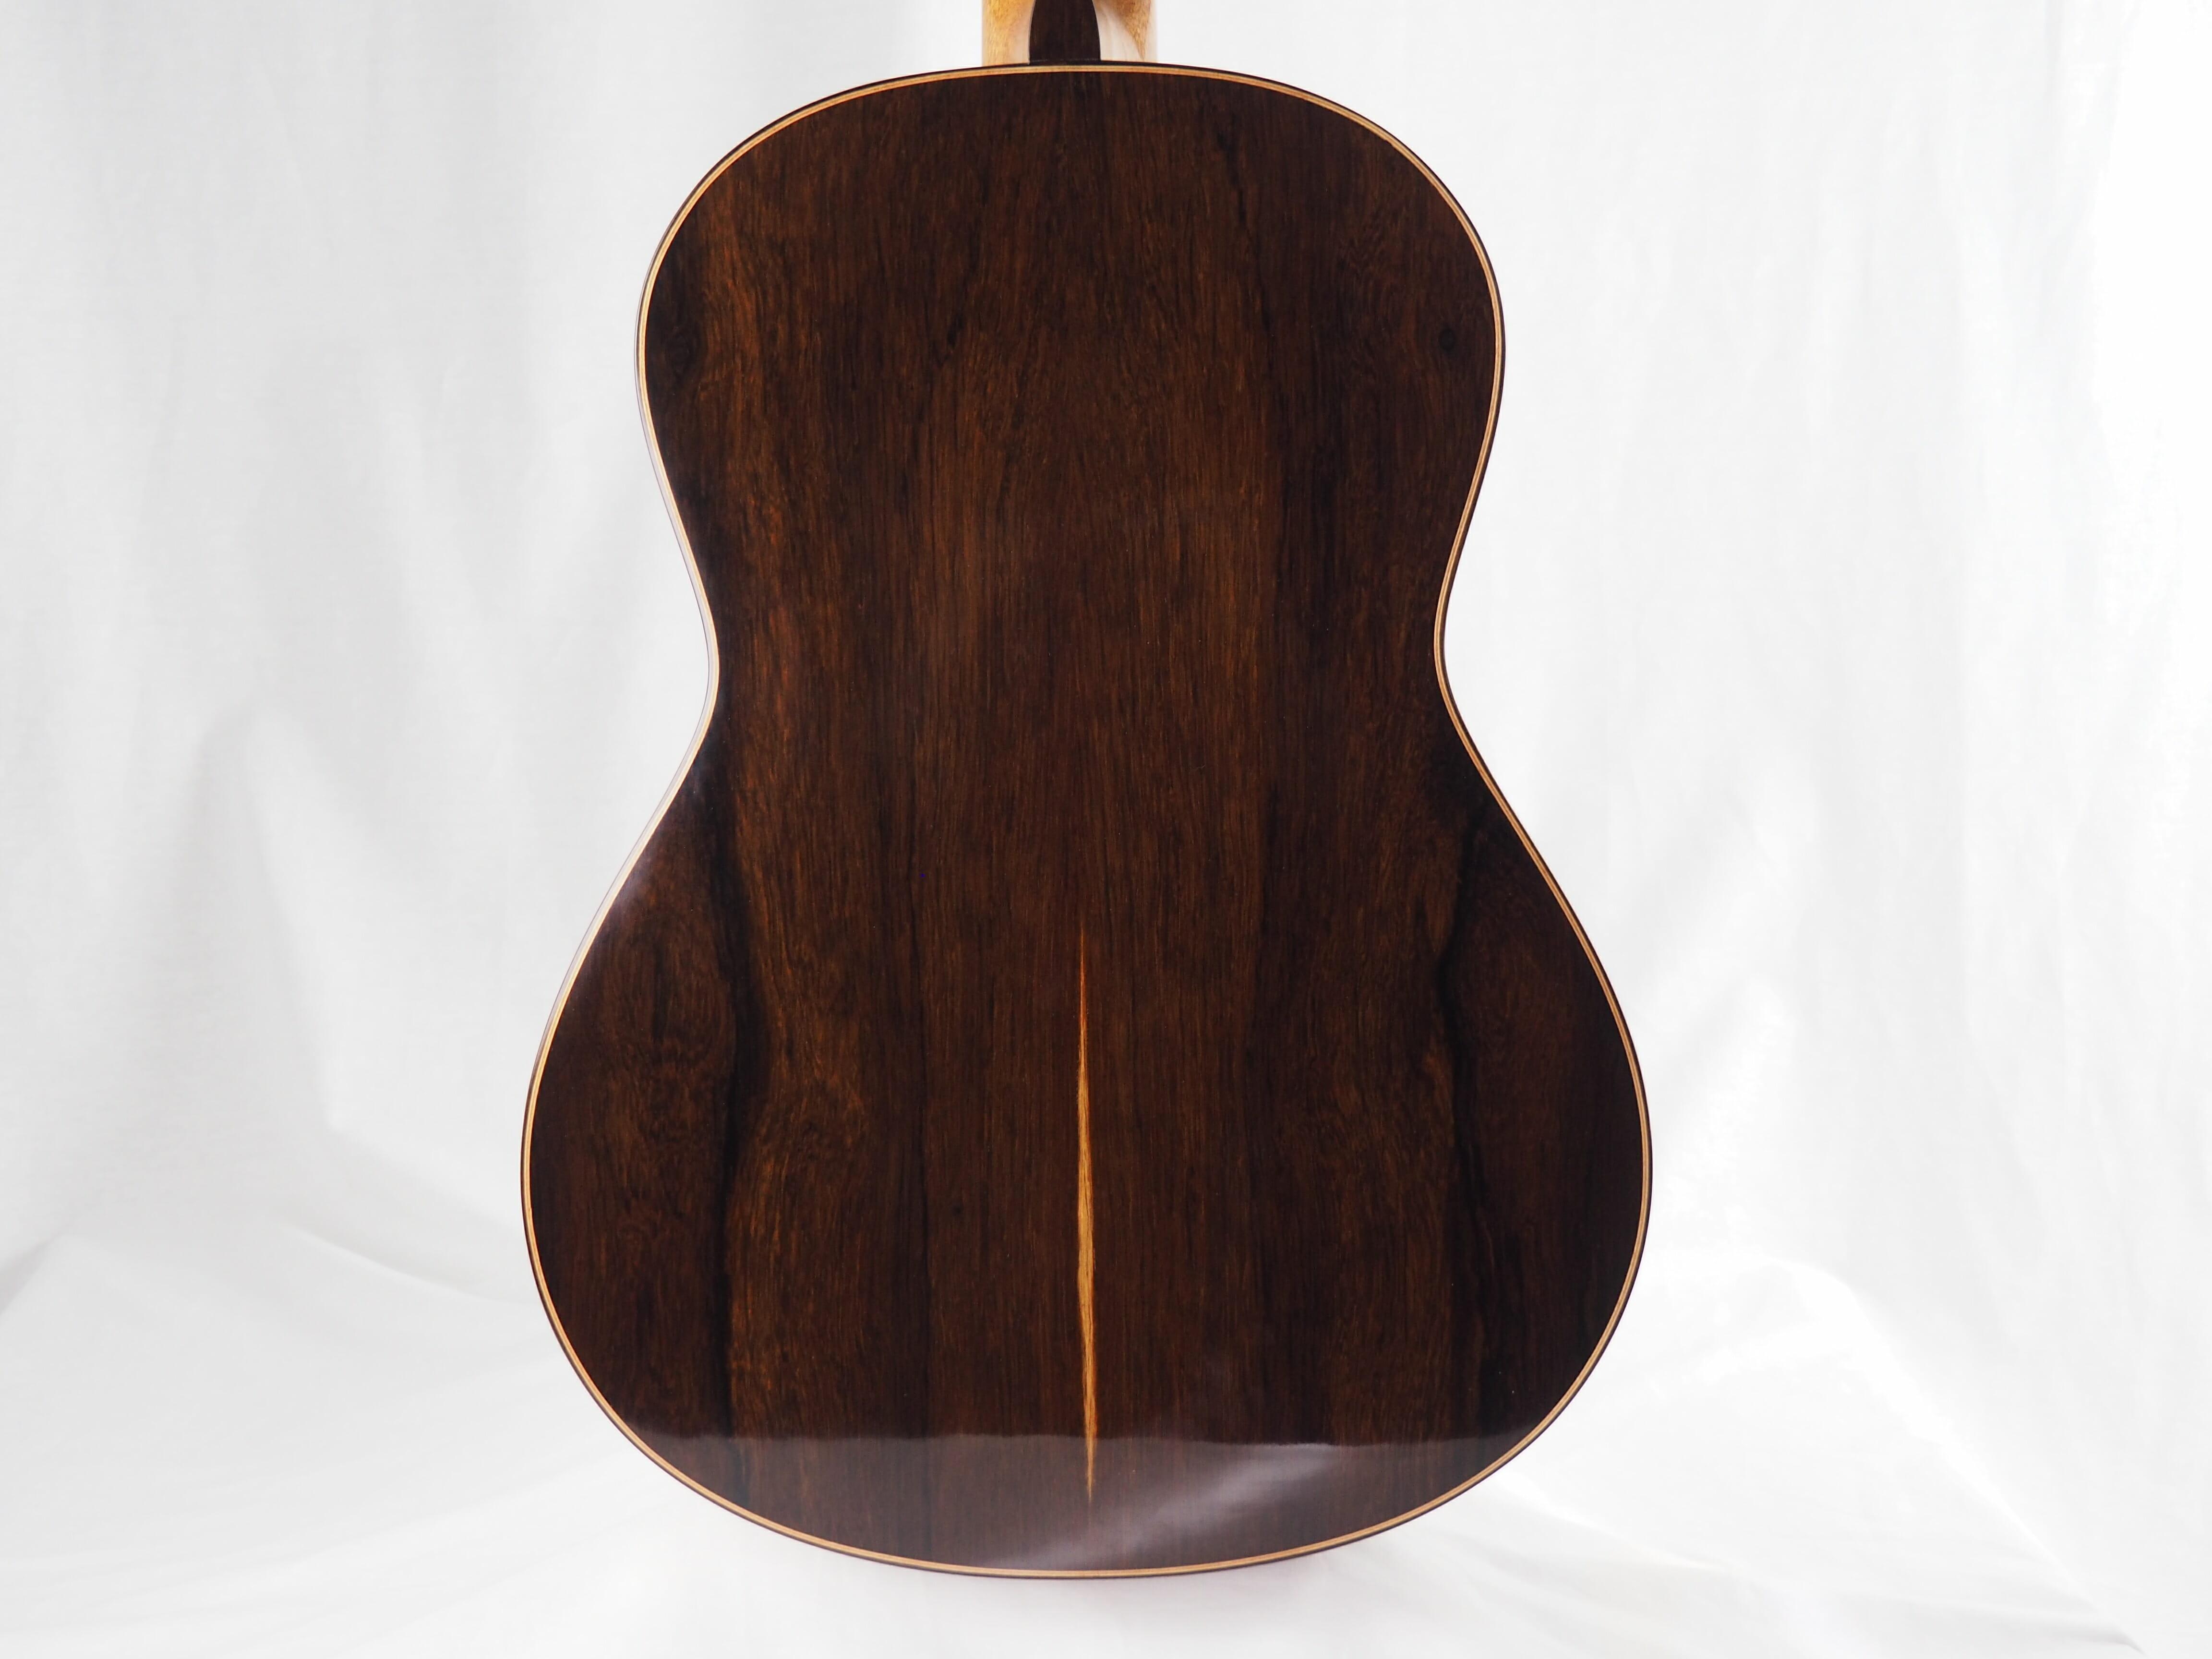 Luthier Keijo Korelin guitare classique double-table 17KOR093-09